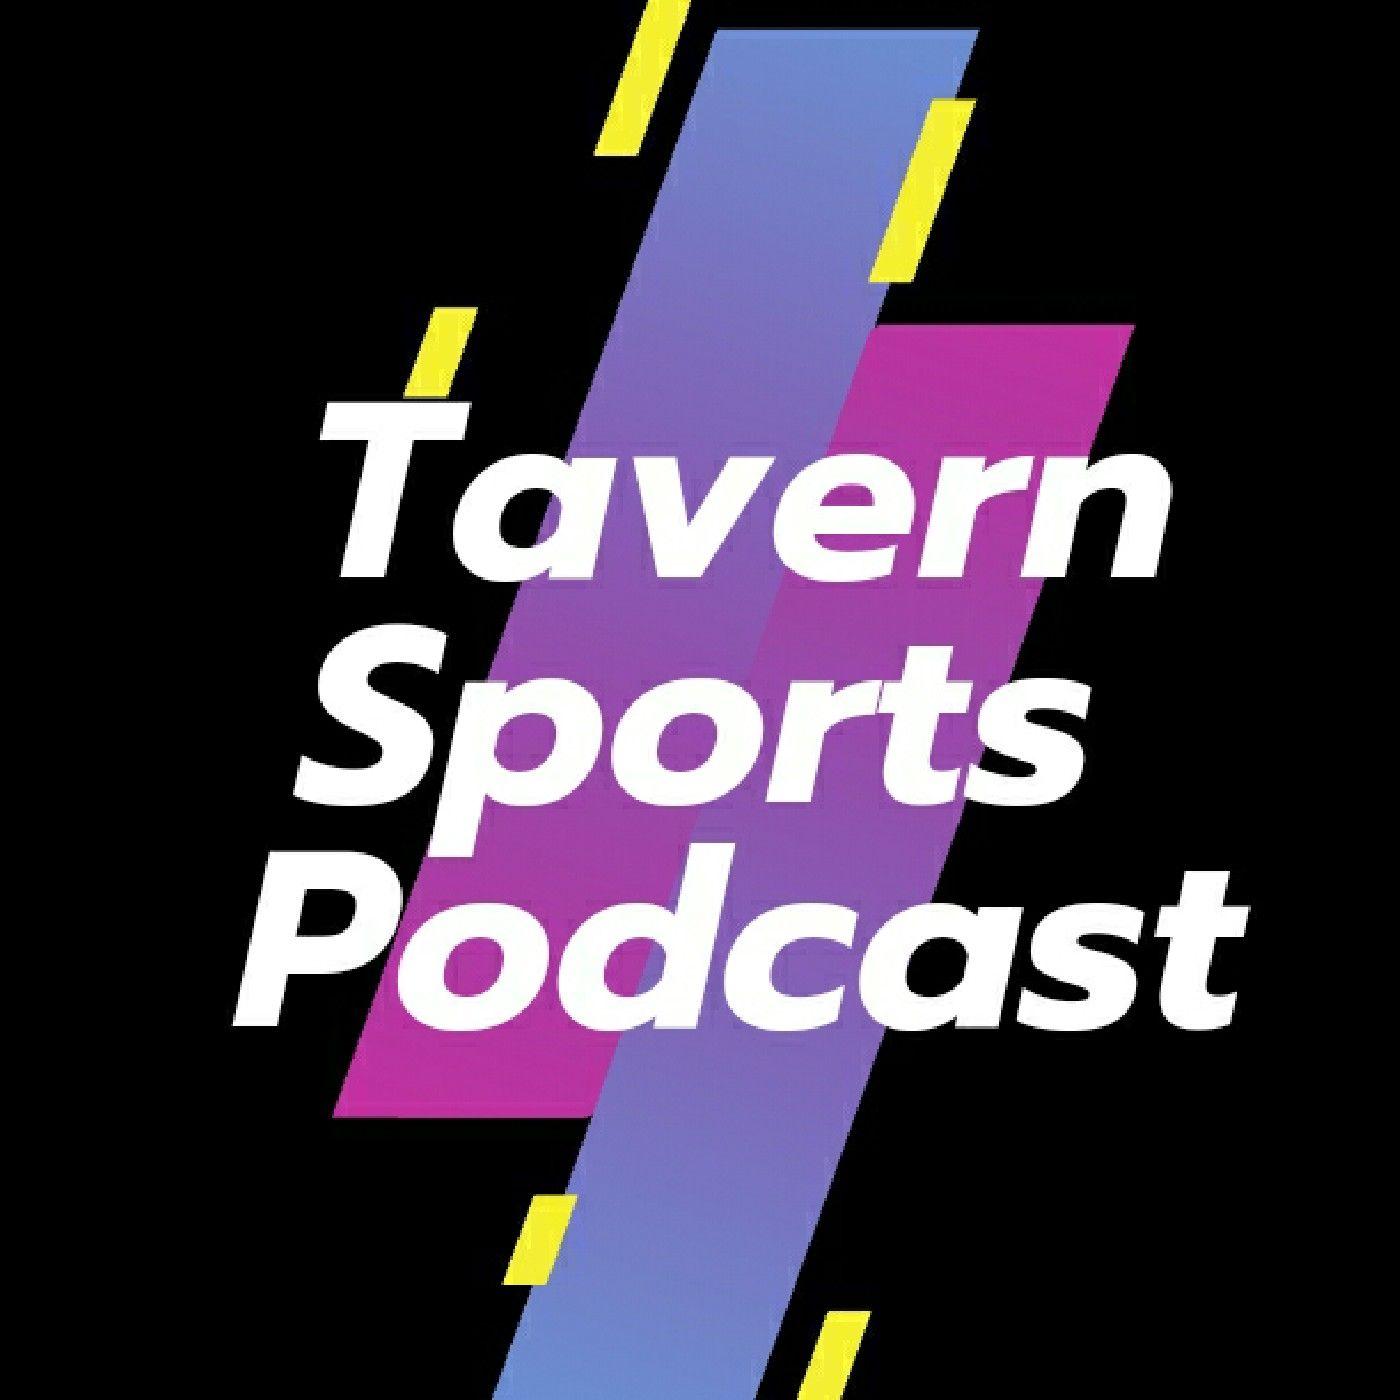 Tavern Sports Podcast